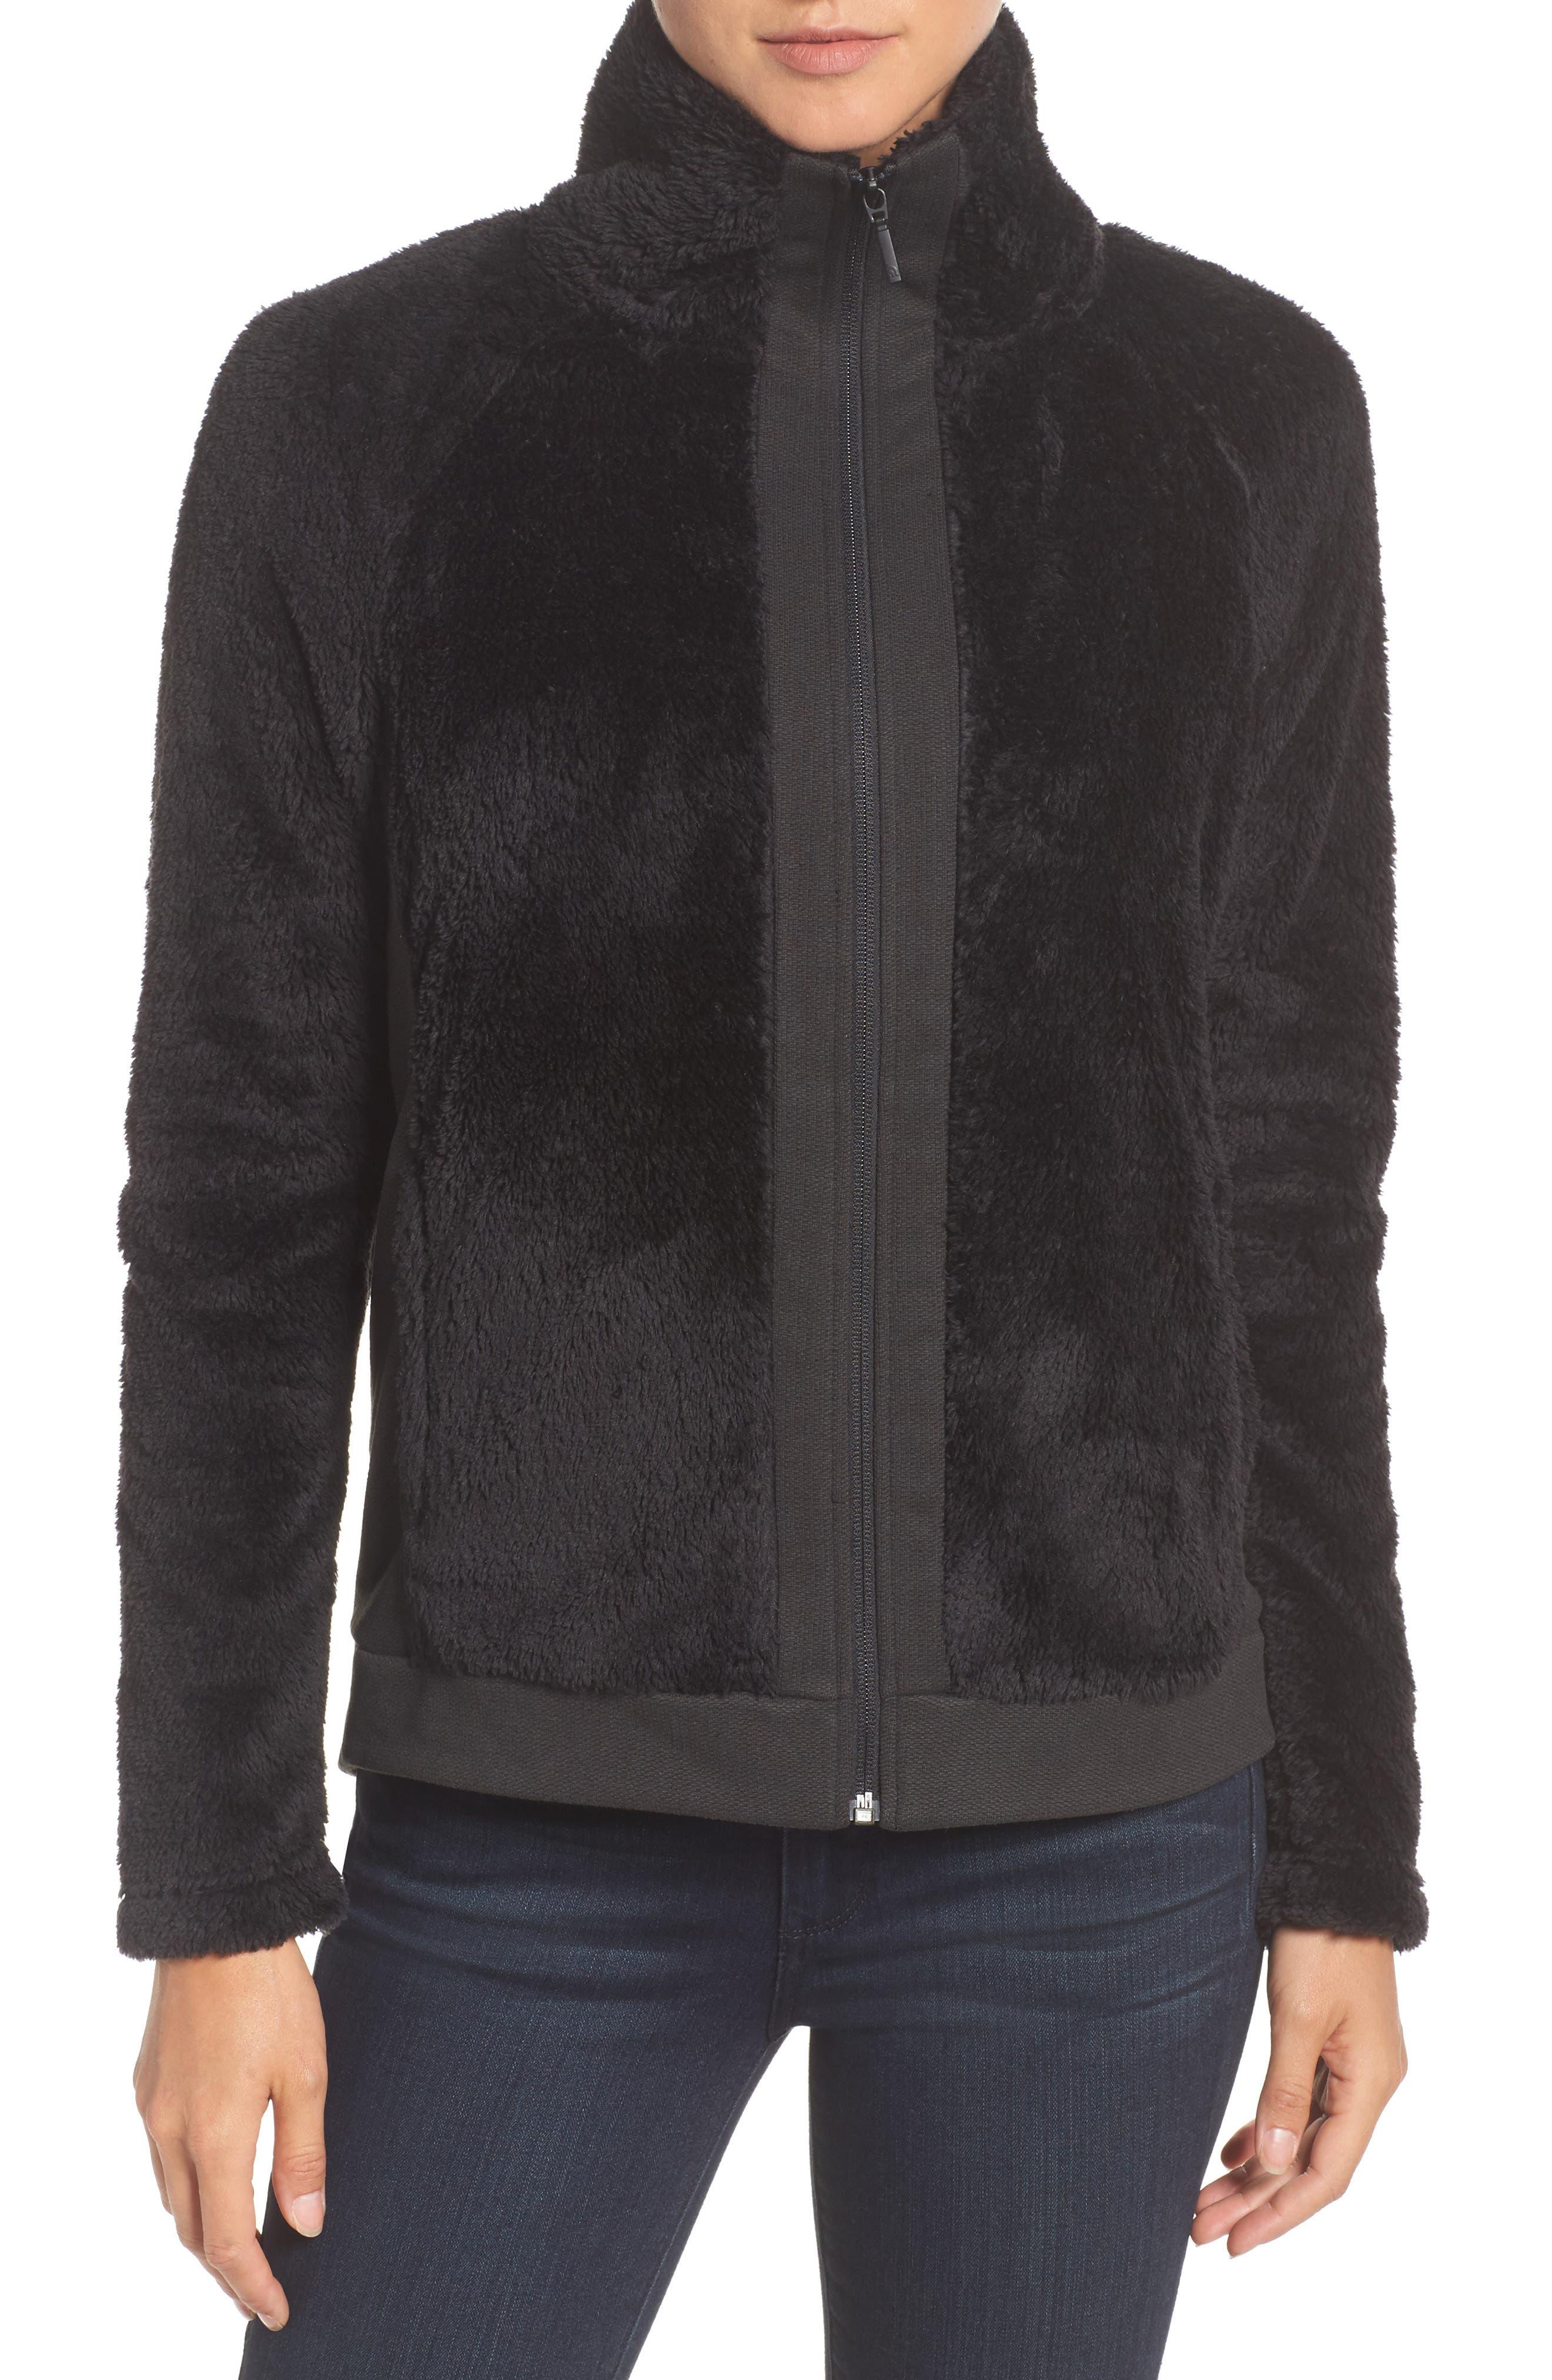 THE NORTH FACE Furry Fleece Jacket, Main, color, TNF BLACK